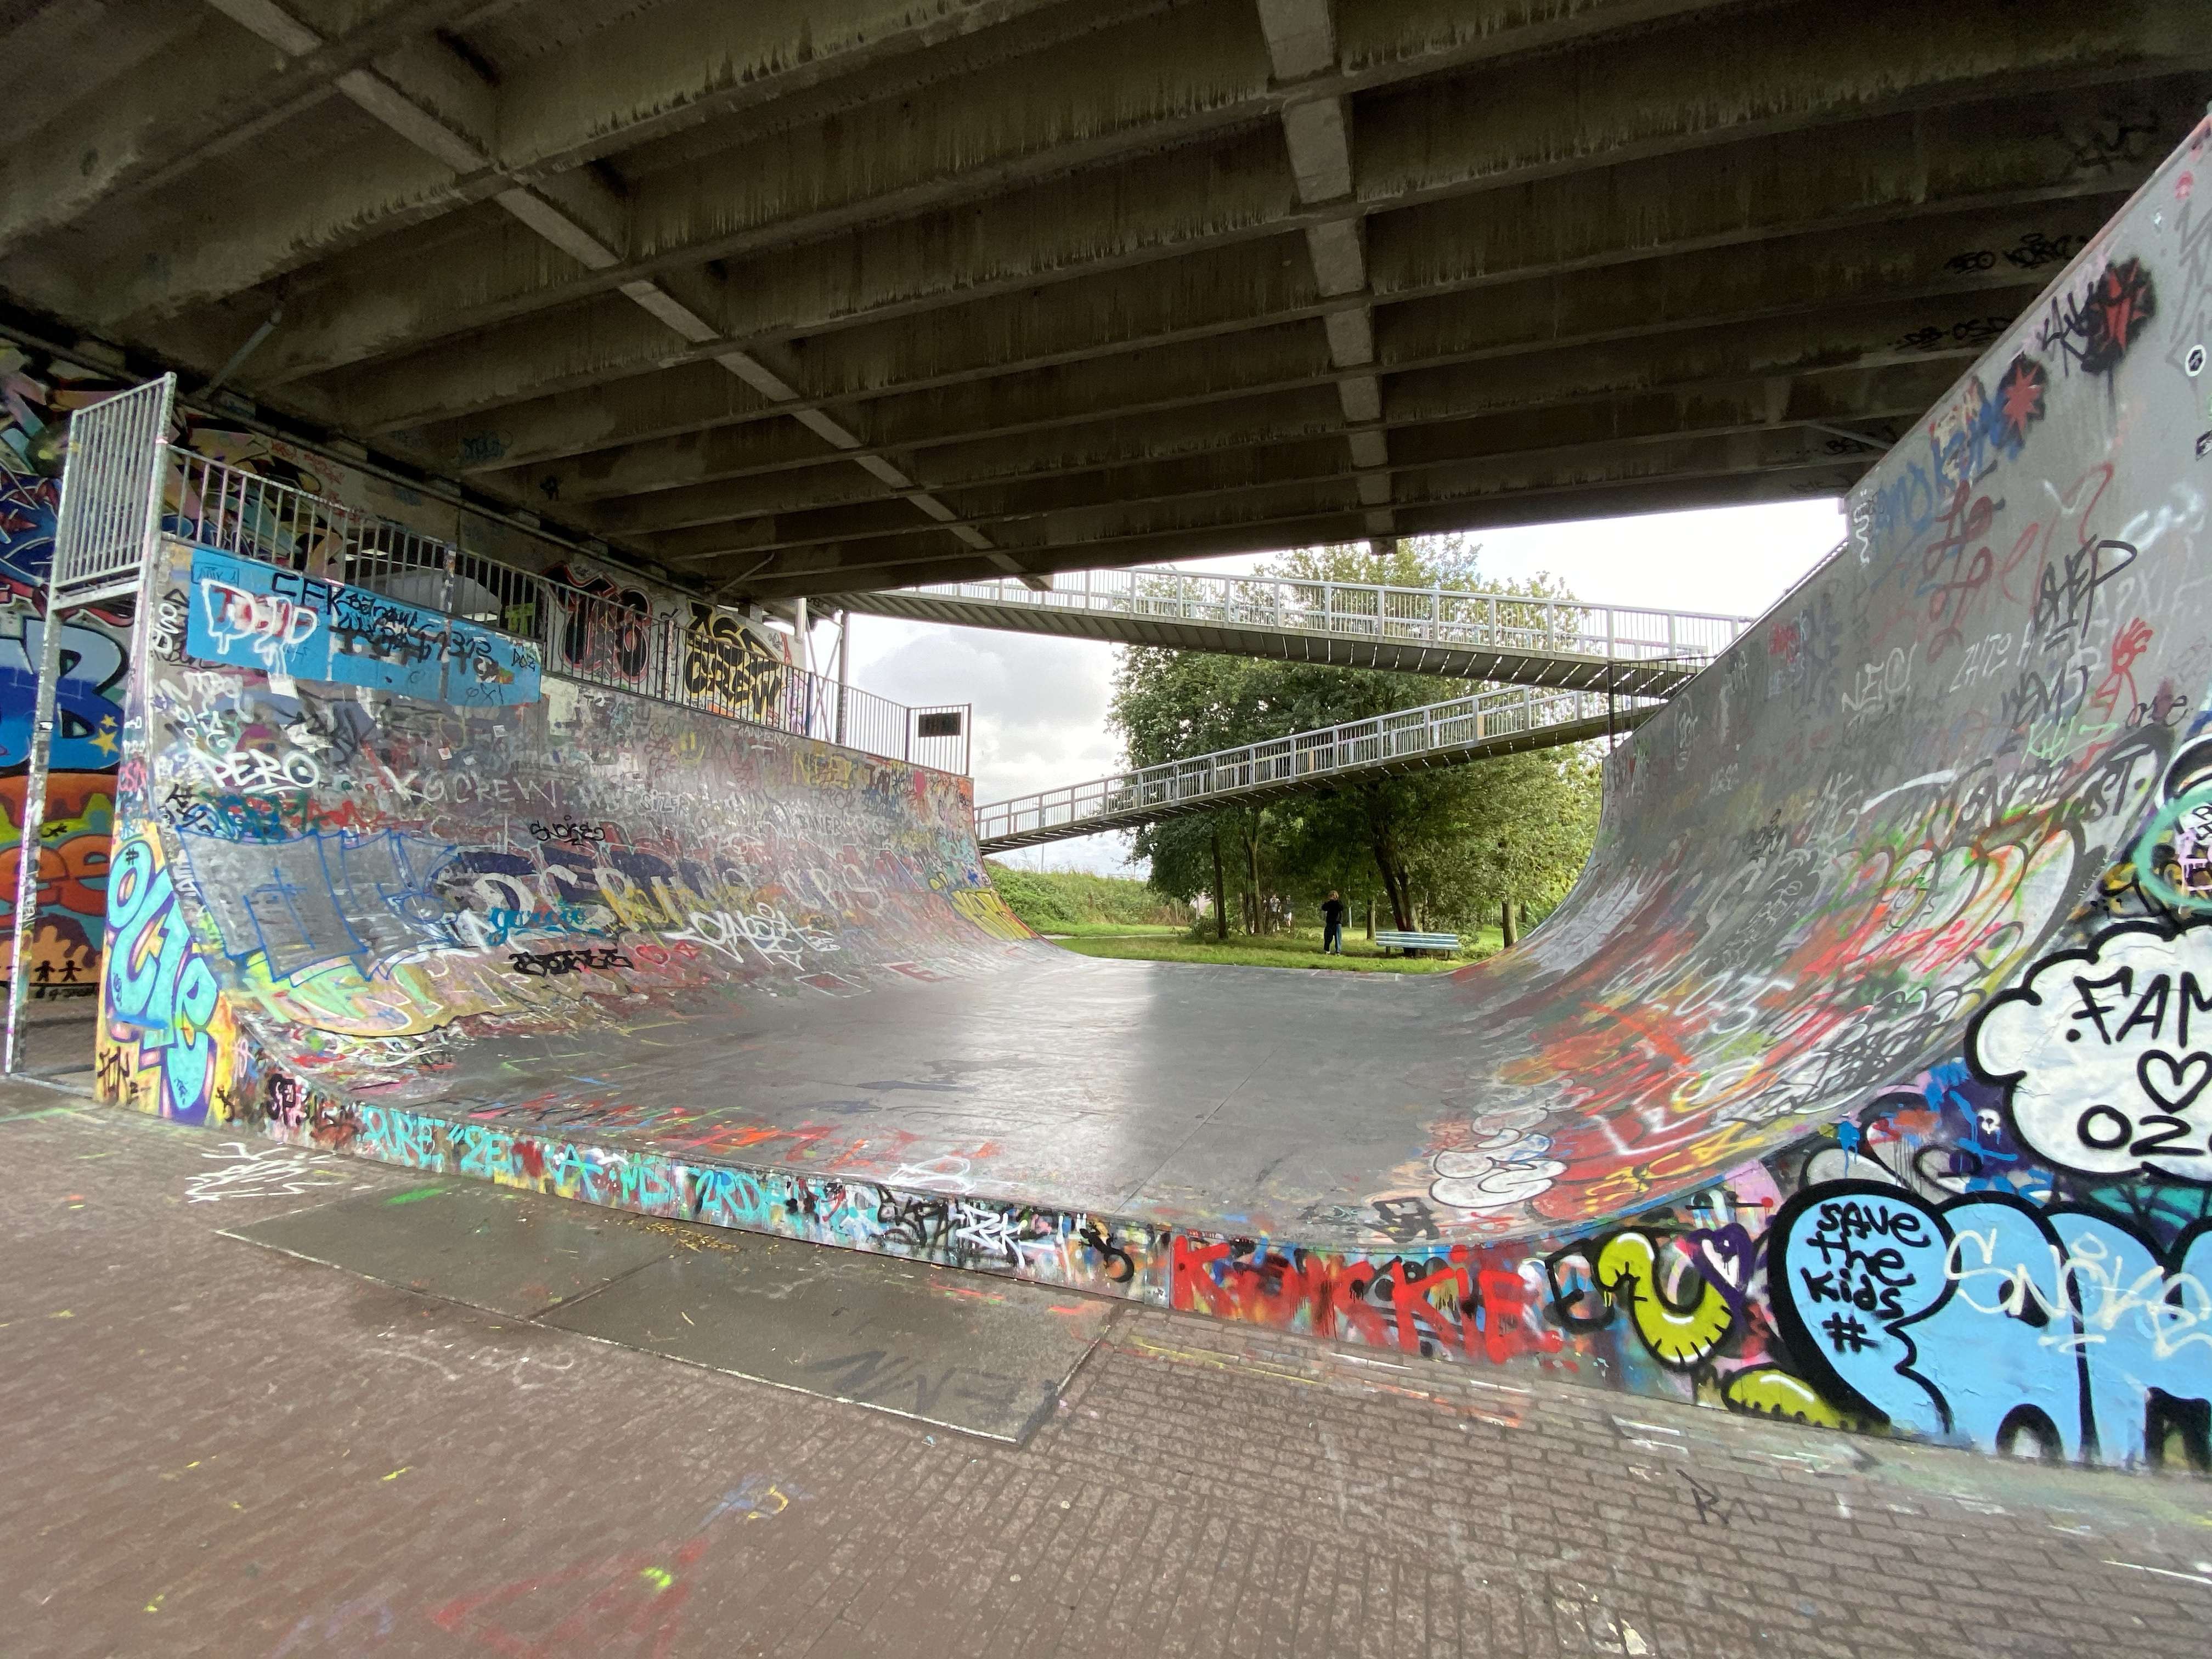 Amsterdam Ramp, under the bridge.